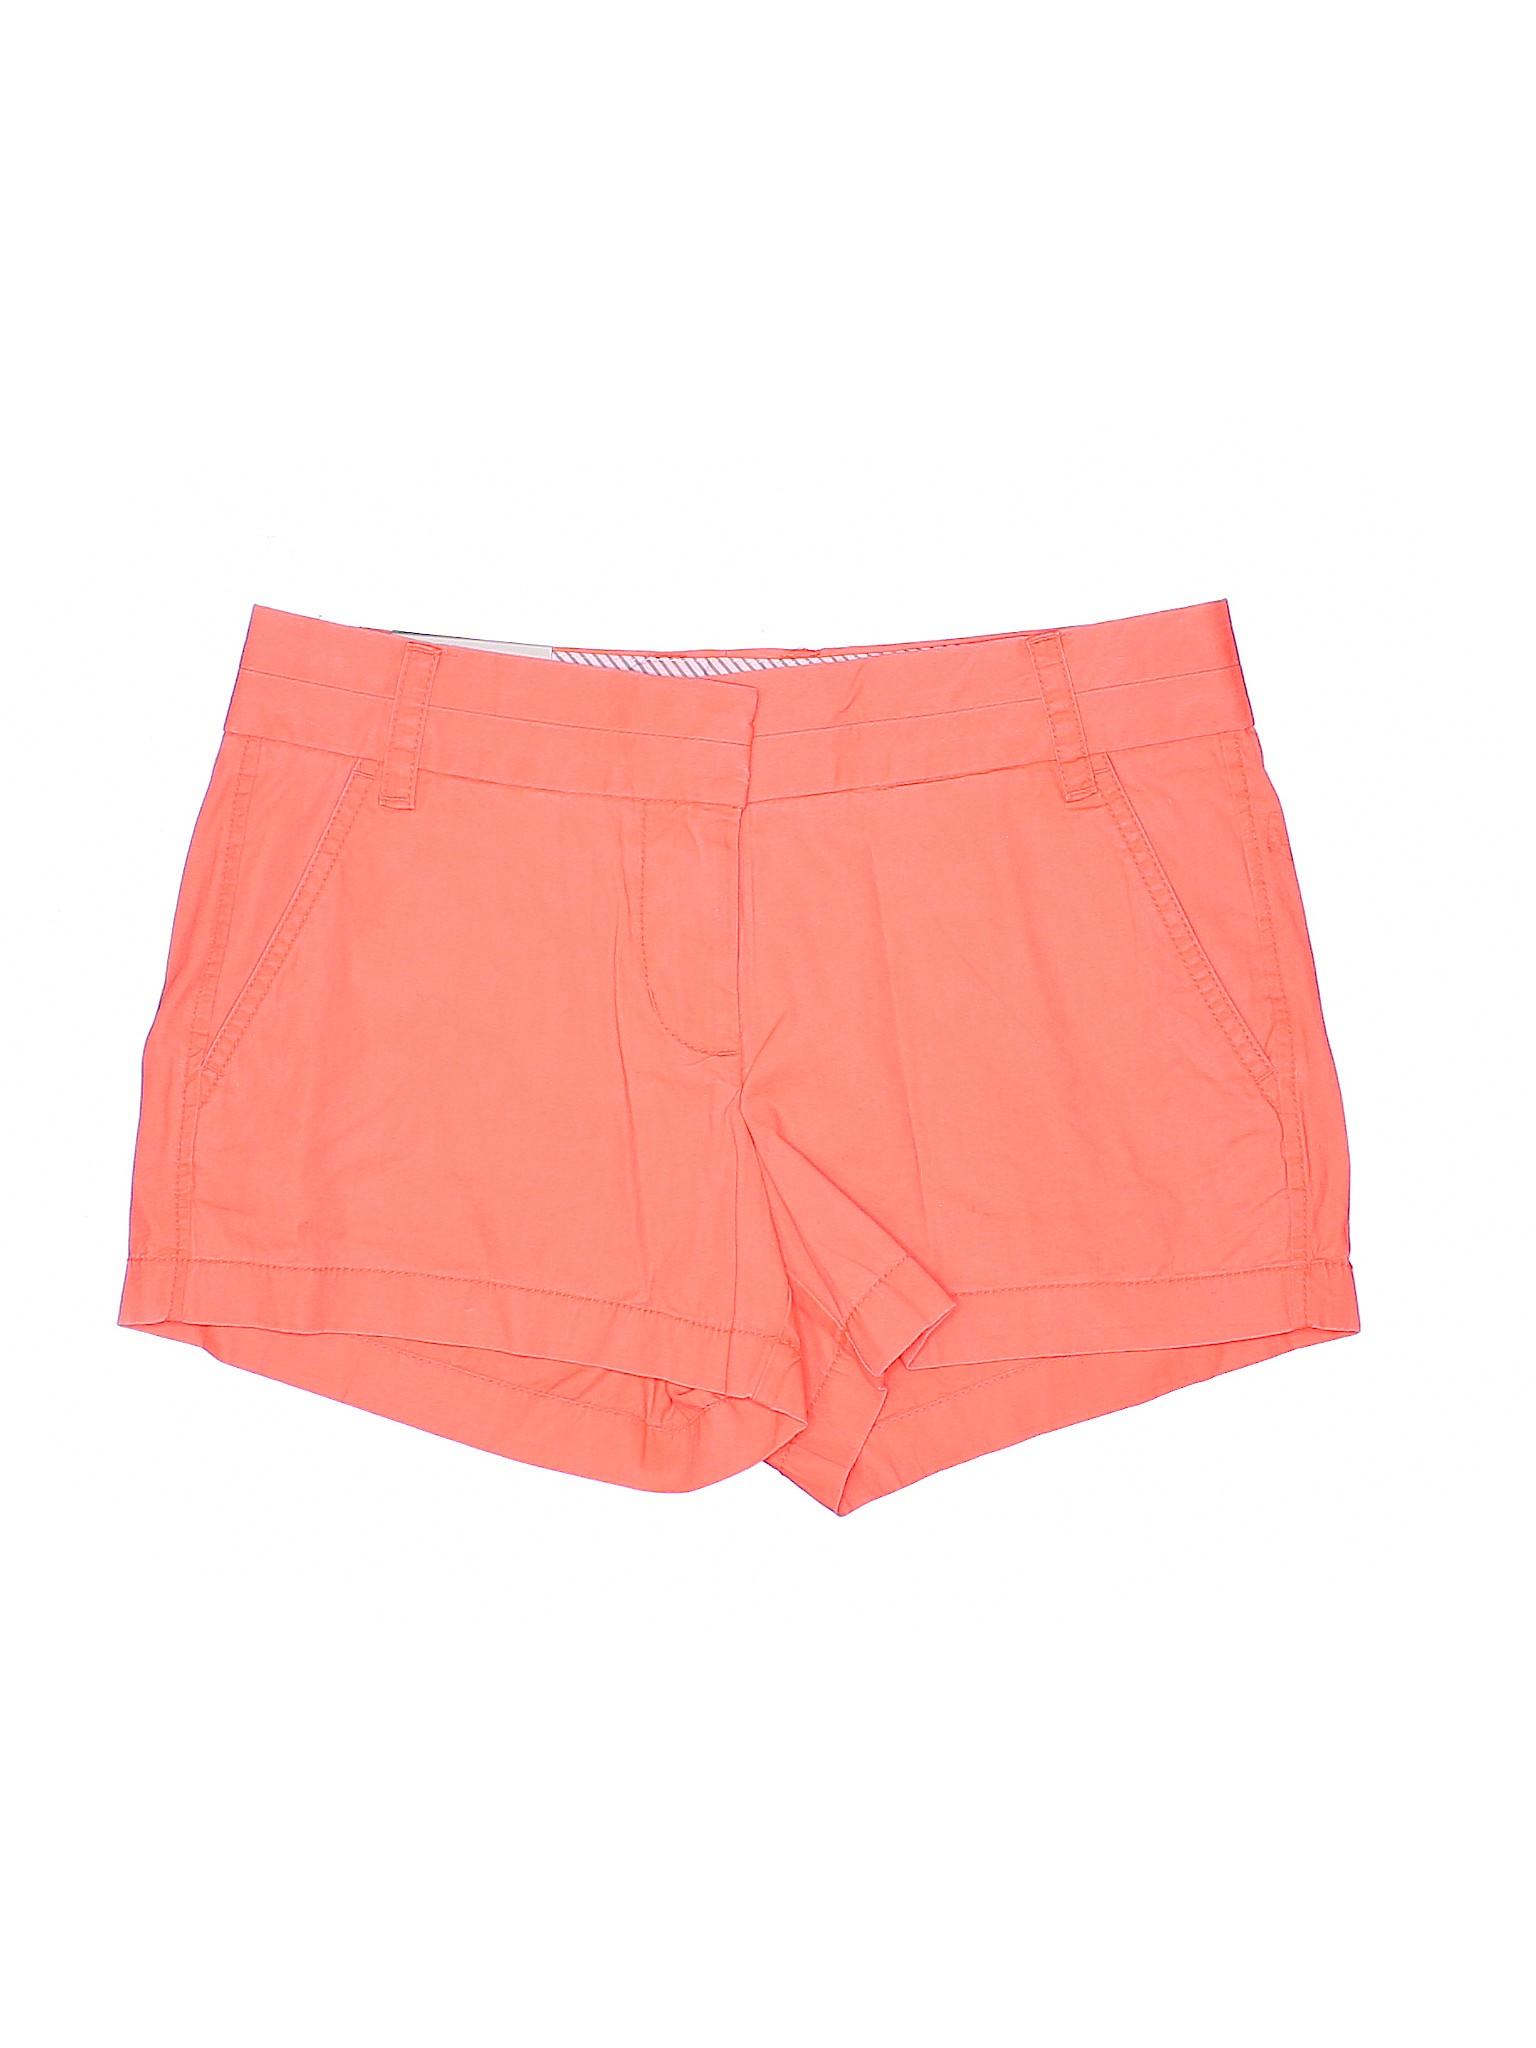 winter Khaki Shorts Leisure Store Crew J Factory dxzwwvqX0